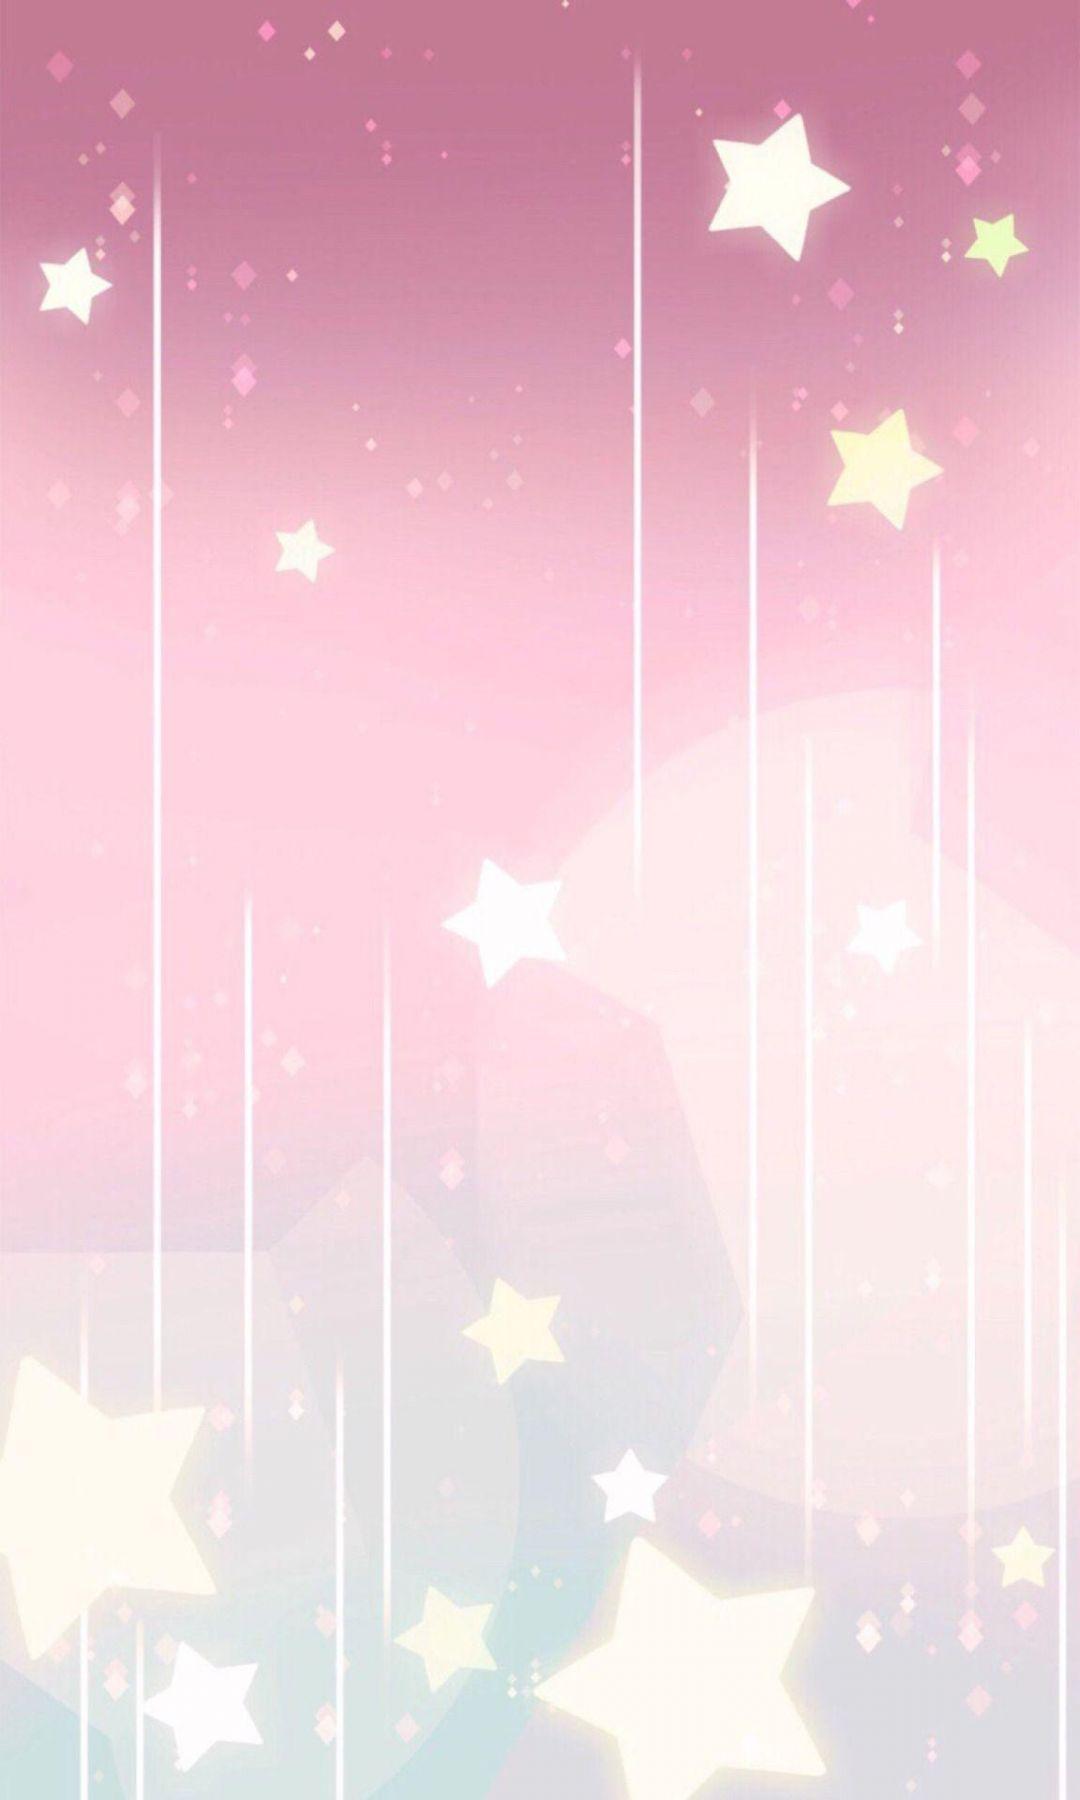 330 3300693 aesthetic pink desktop hd wallpapers 1080p 4k 37451